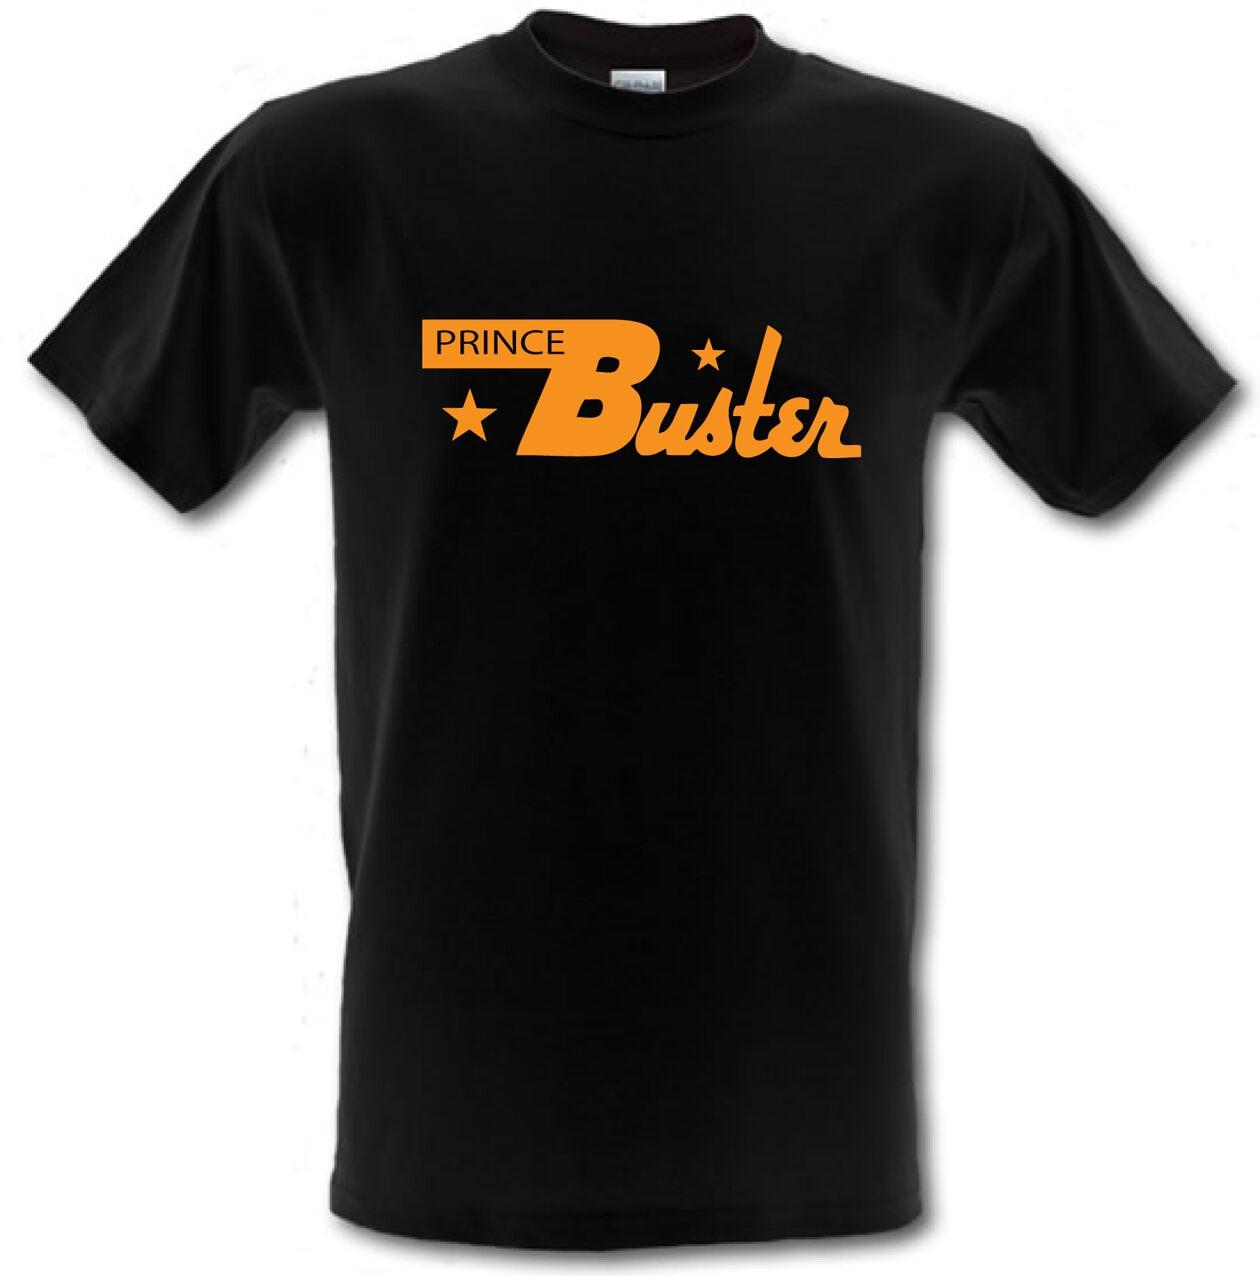 PRINCE BUSTER Ska Legend Logo Rocksteady Jamaica Heavy Cotton T shirt ALL SIZES